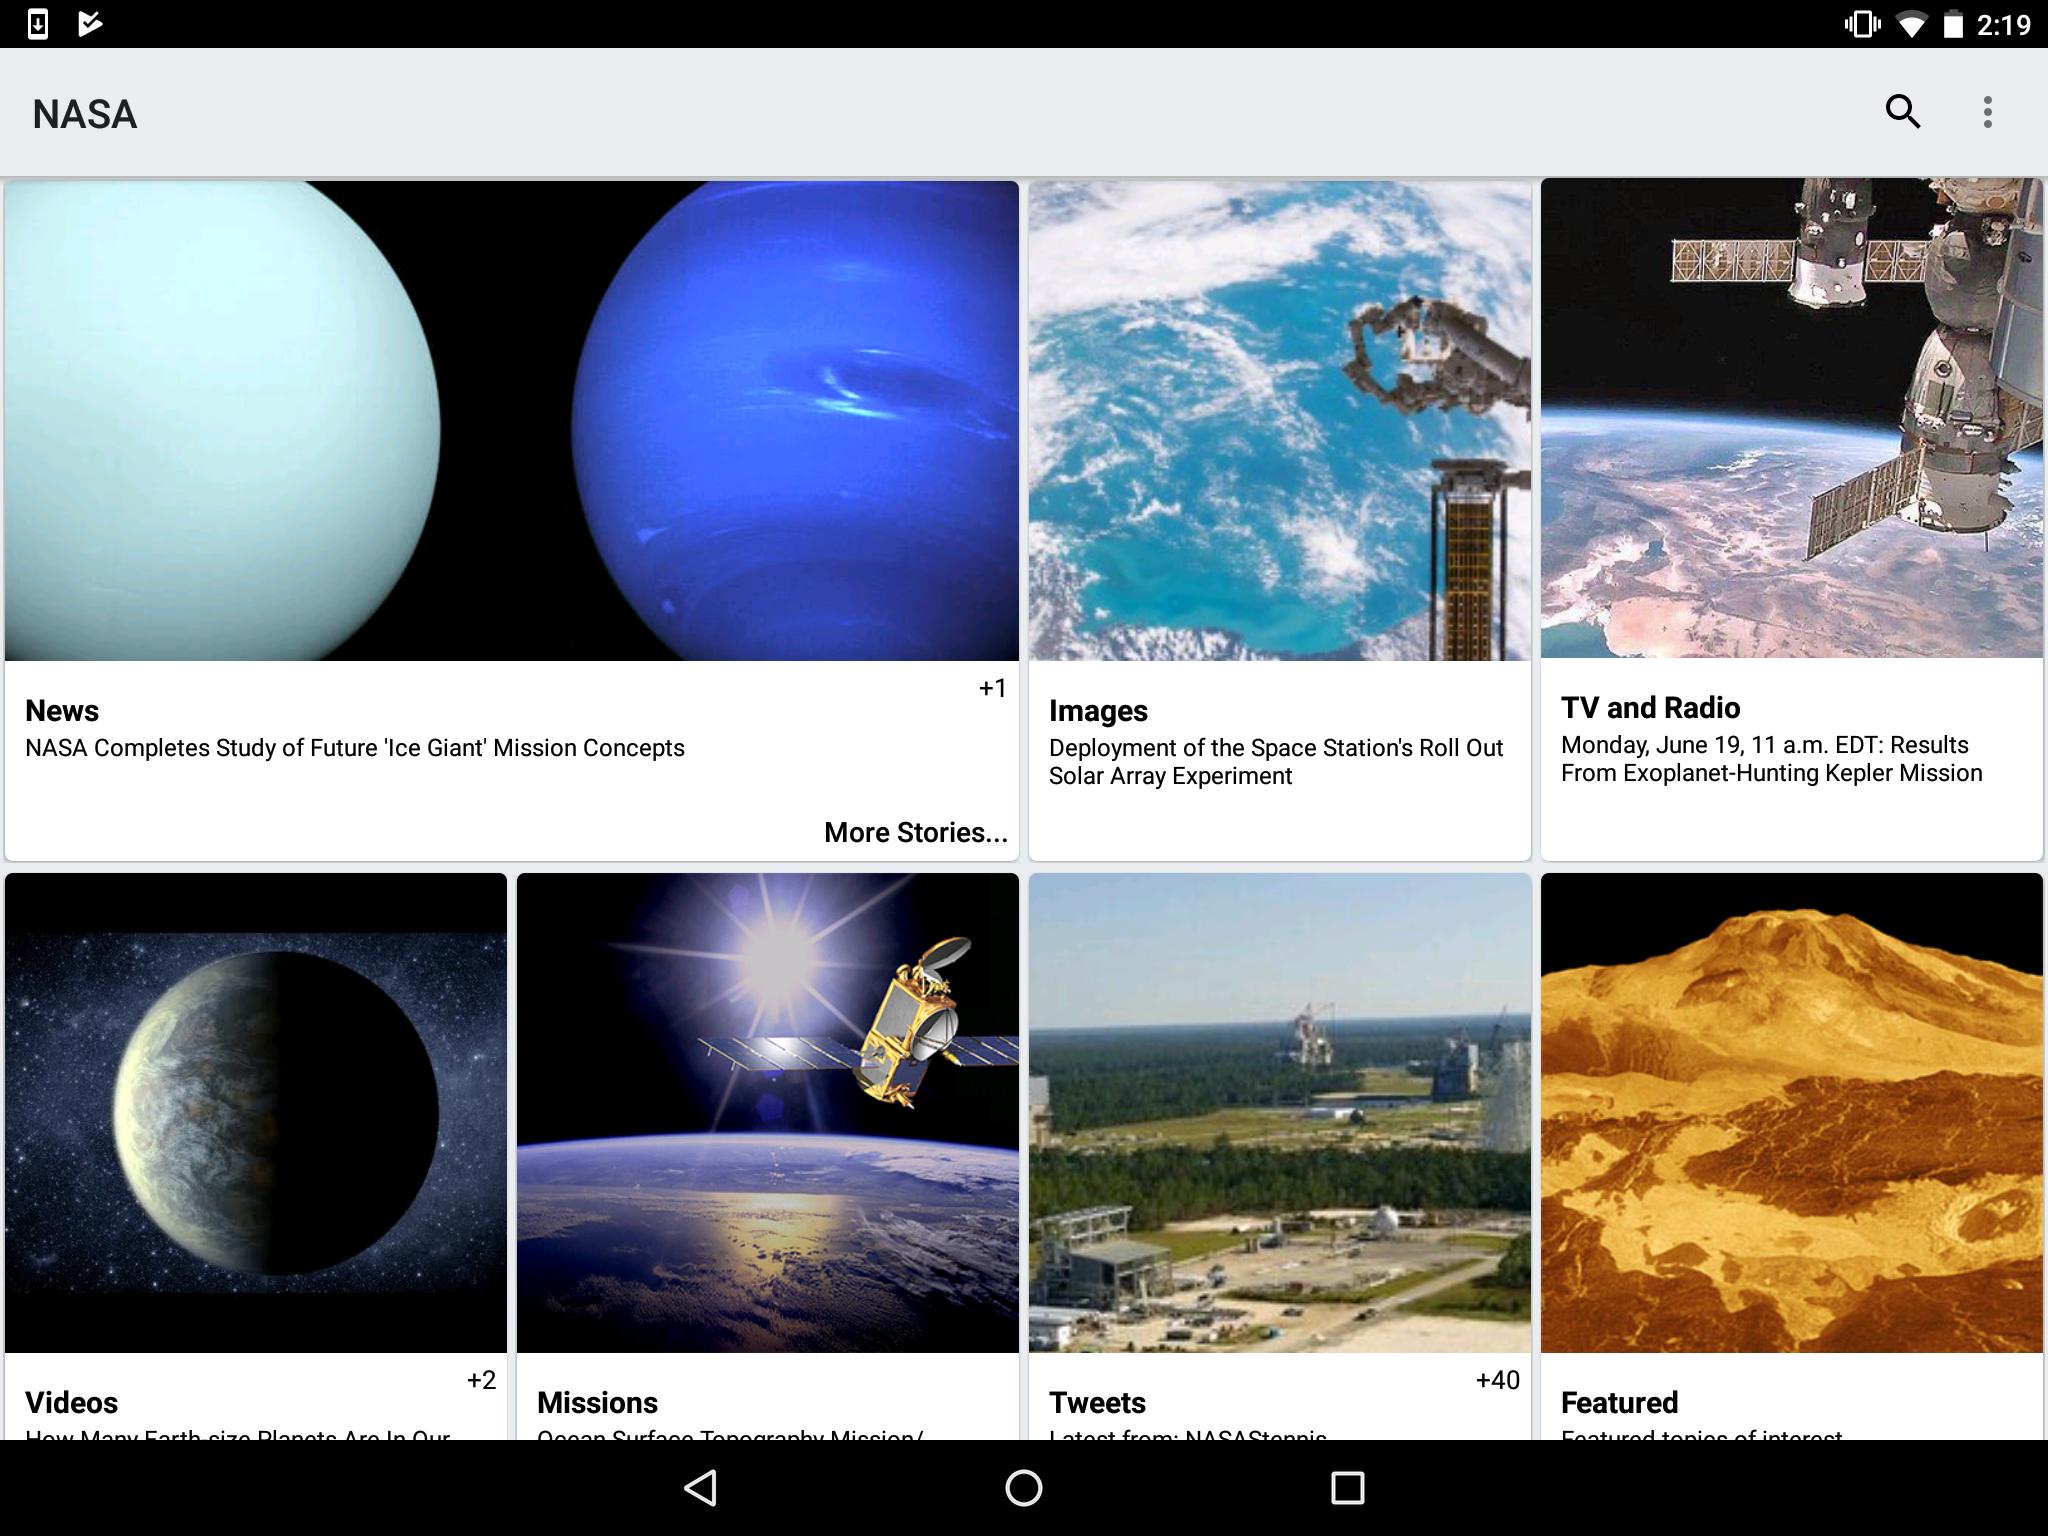 NASA App for Smartphones, Tablets and Digital Media Players